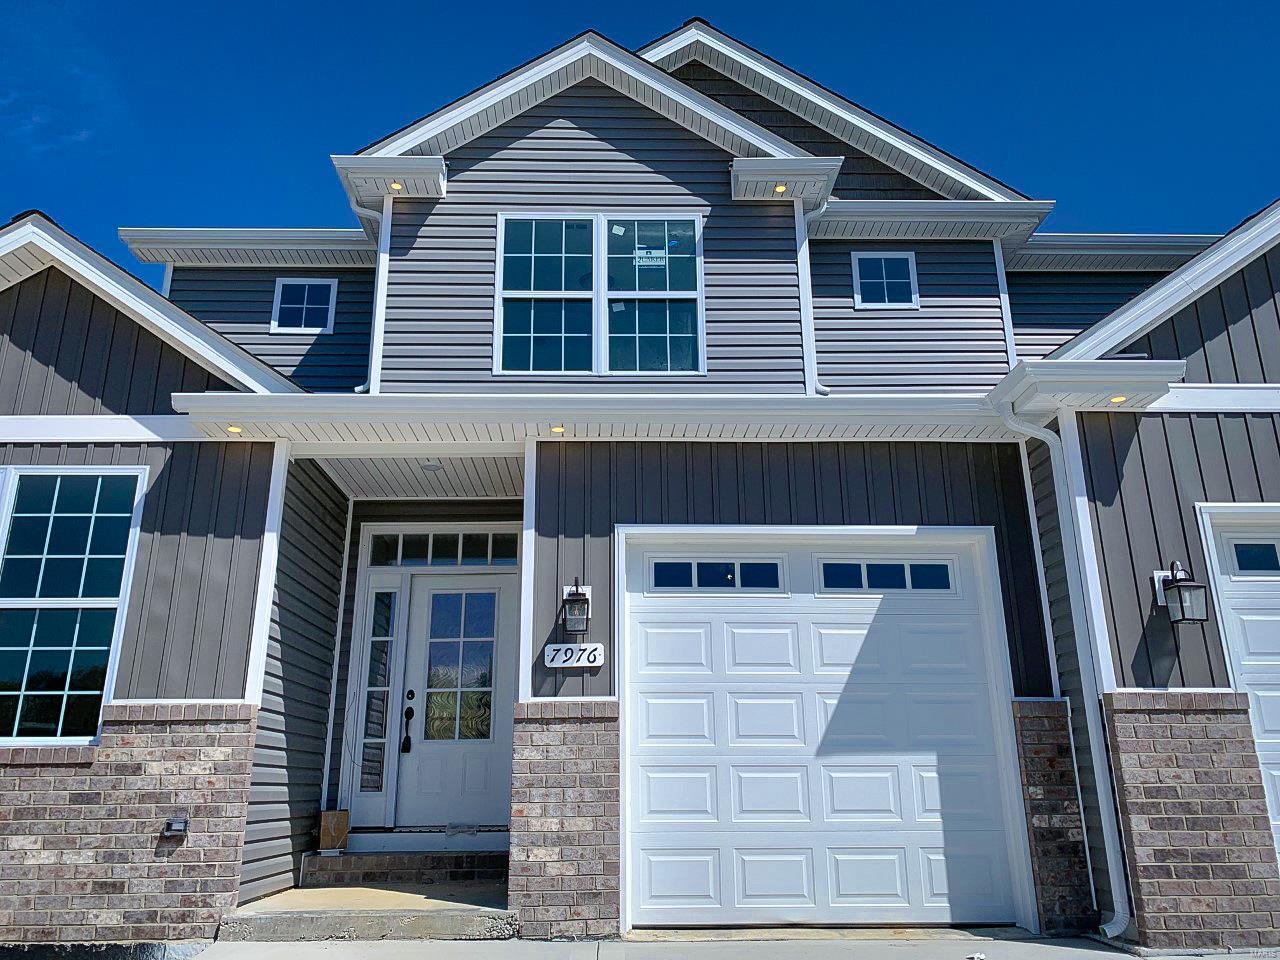 7976 Donner Ridge Property Photo - Caseyville, IL real estate listing